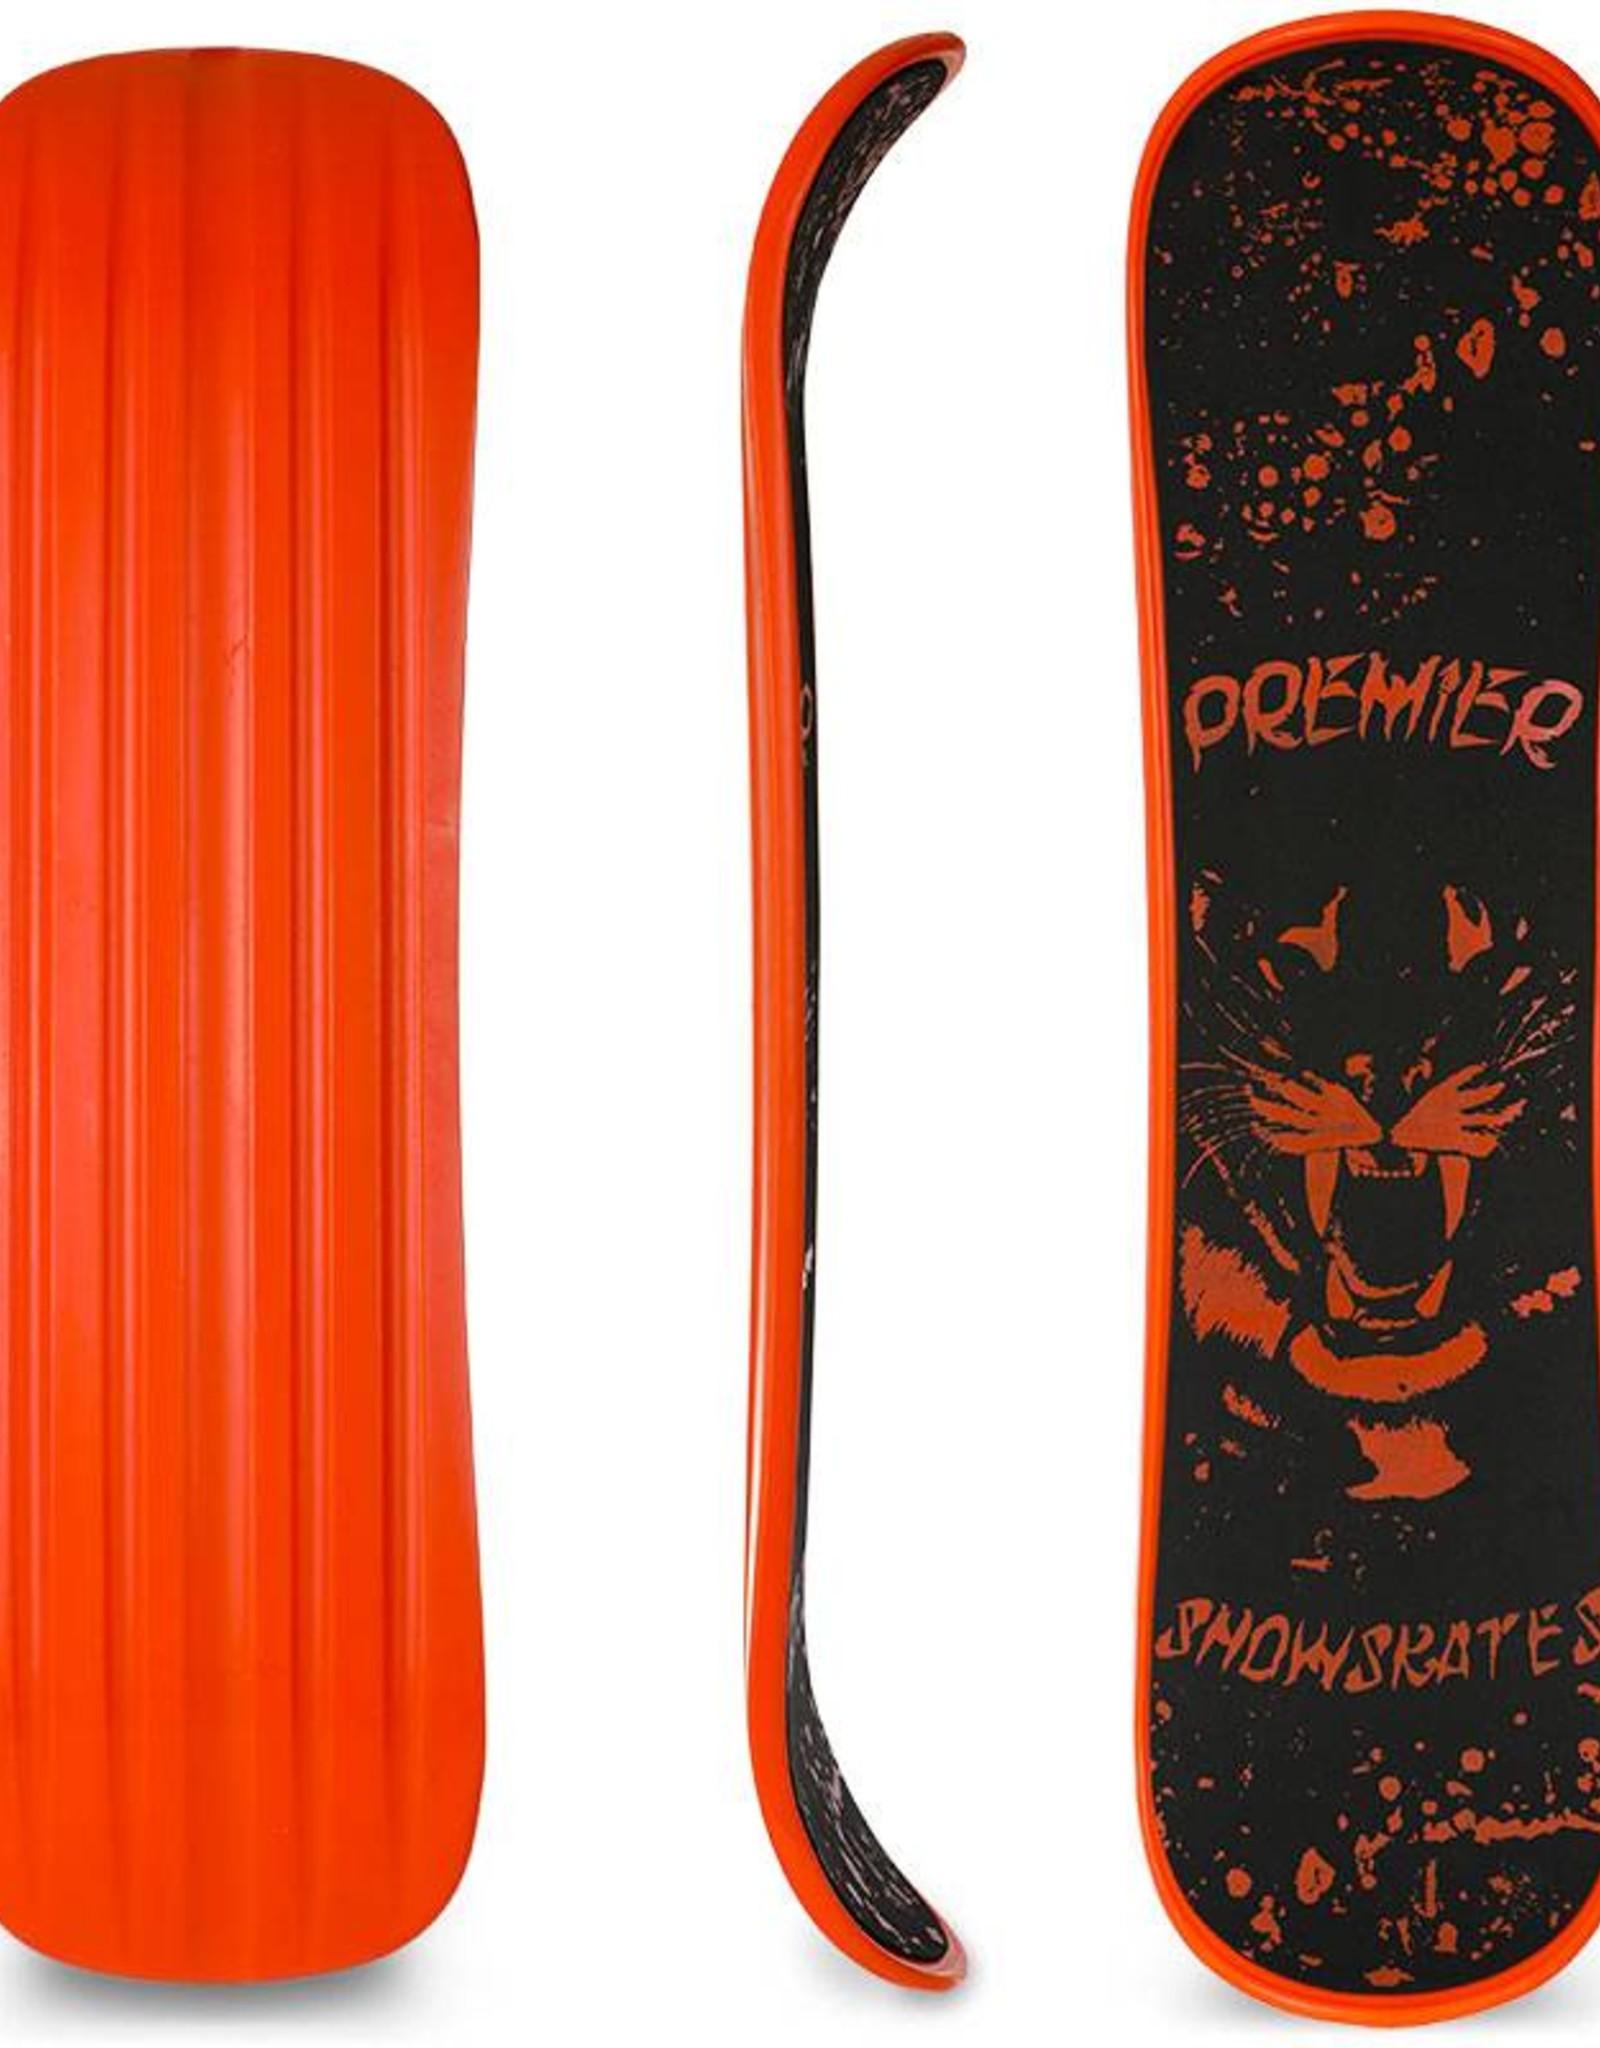 "Premier Snowskates Premier Tigerstyle 35"" Single Deck Snowskate for Advanced Riders"